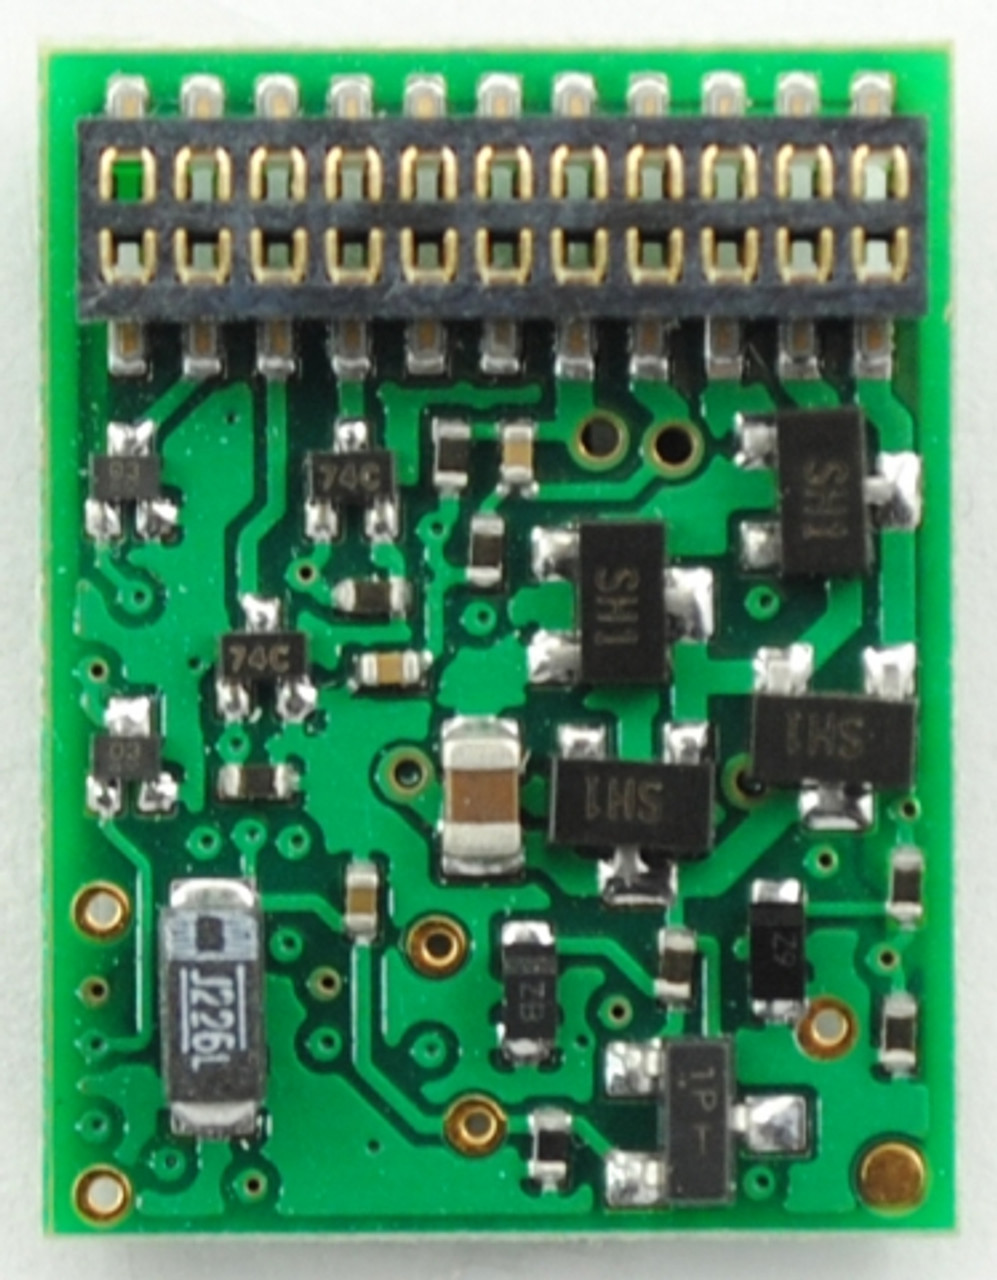 1344 TCS Train Control Systems /  EU621 Decoder (SCALE=HO) Part # 745-1344